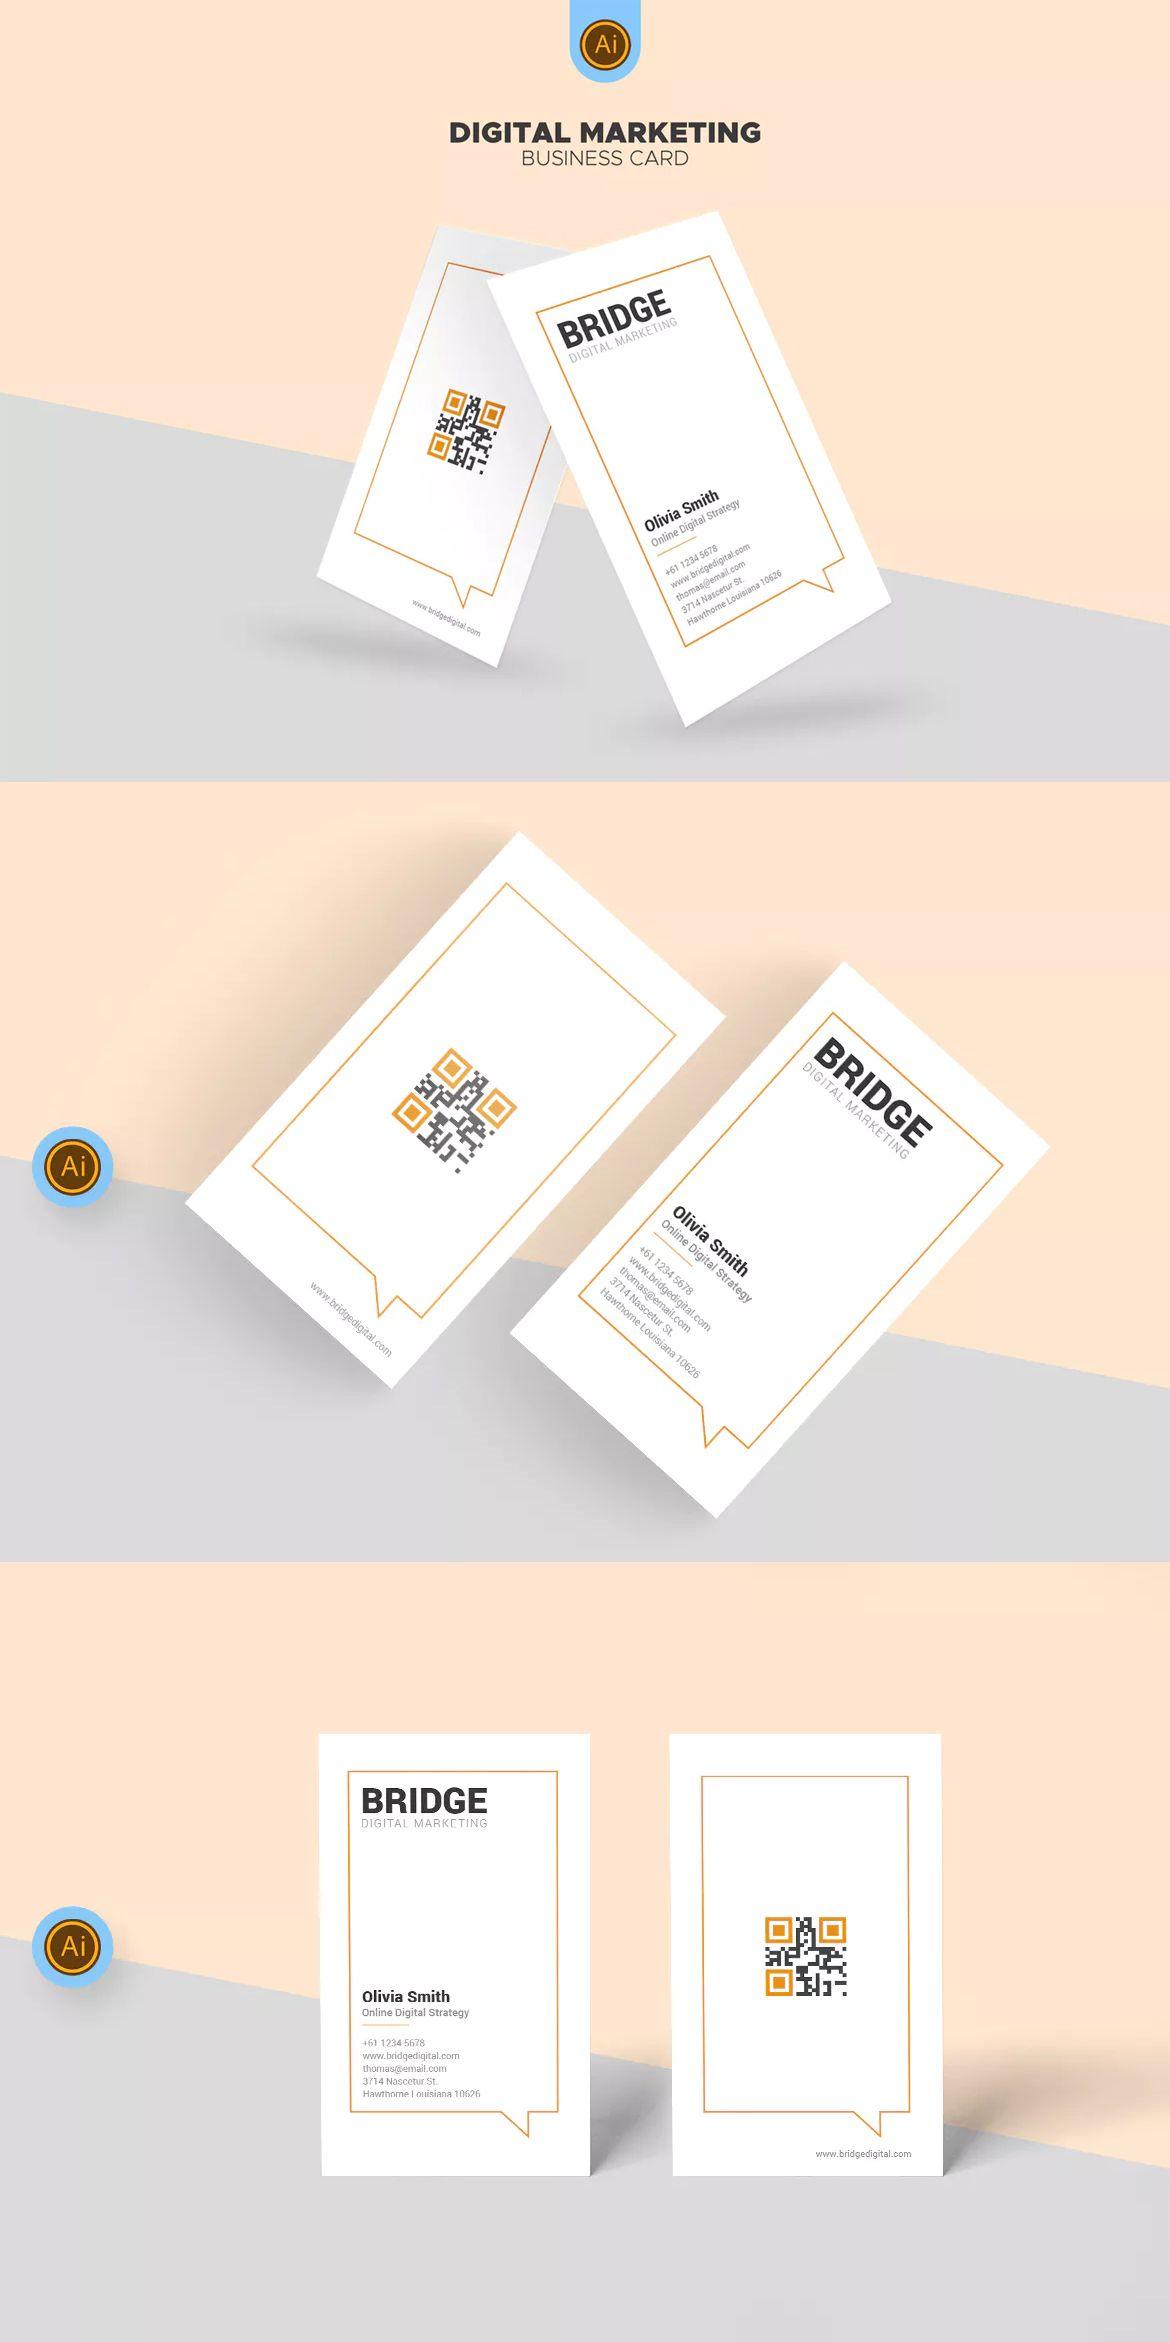 Bridge digital marketing business card template ai business card bridge digital marketing business card template ai wajeb Images